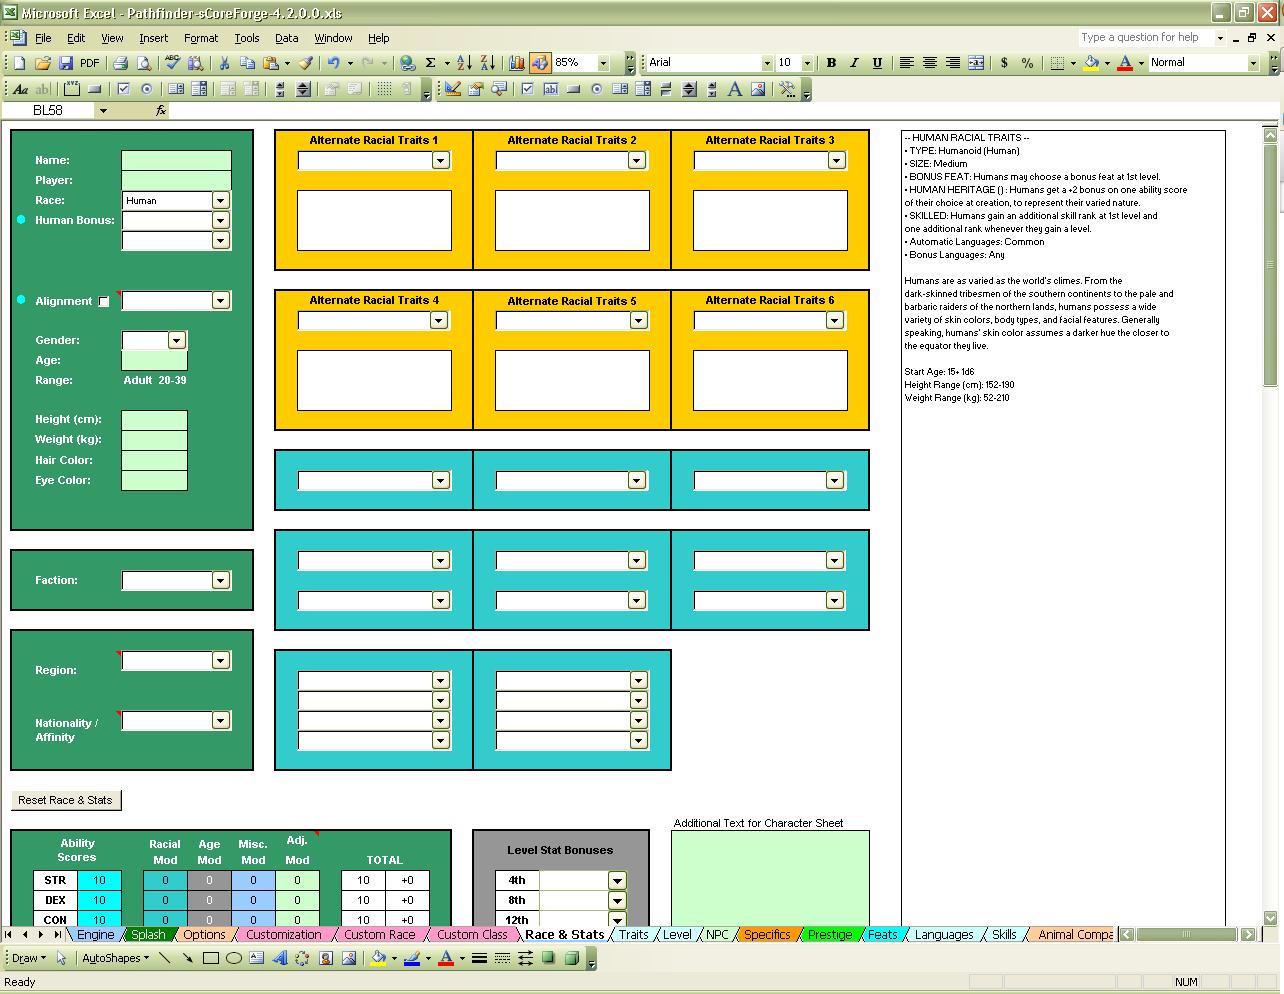 Pathfinder Downtime Spreadsheet In Nikki Scoreforge